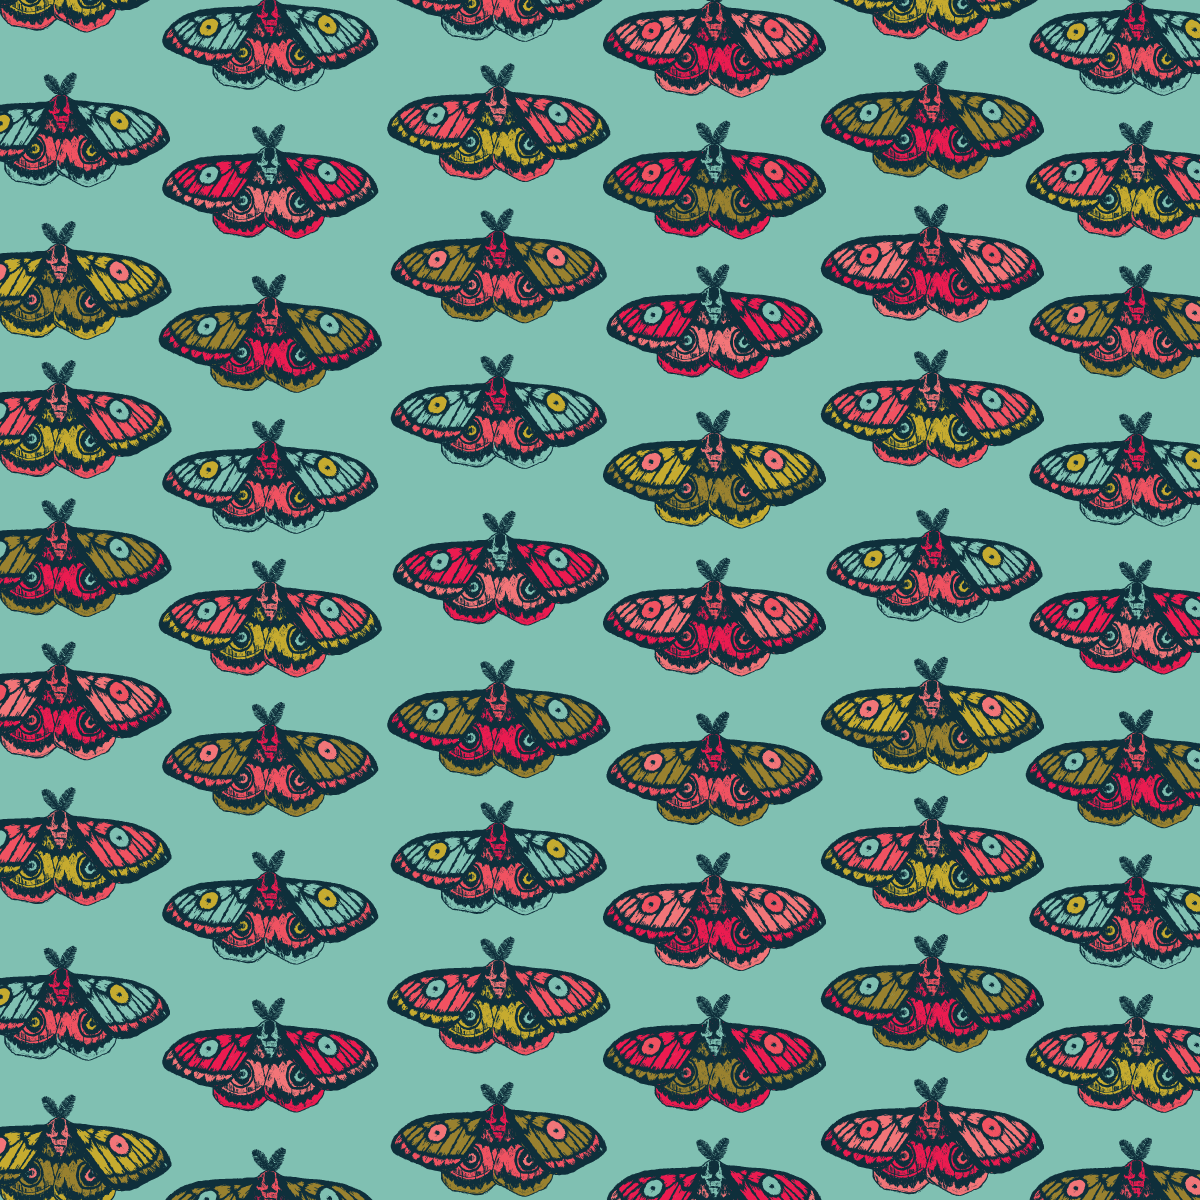 moth-pattern-2.png